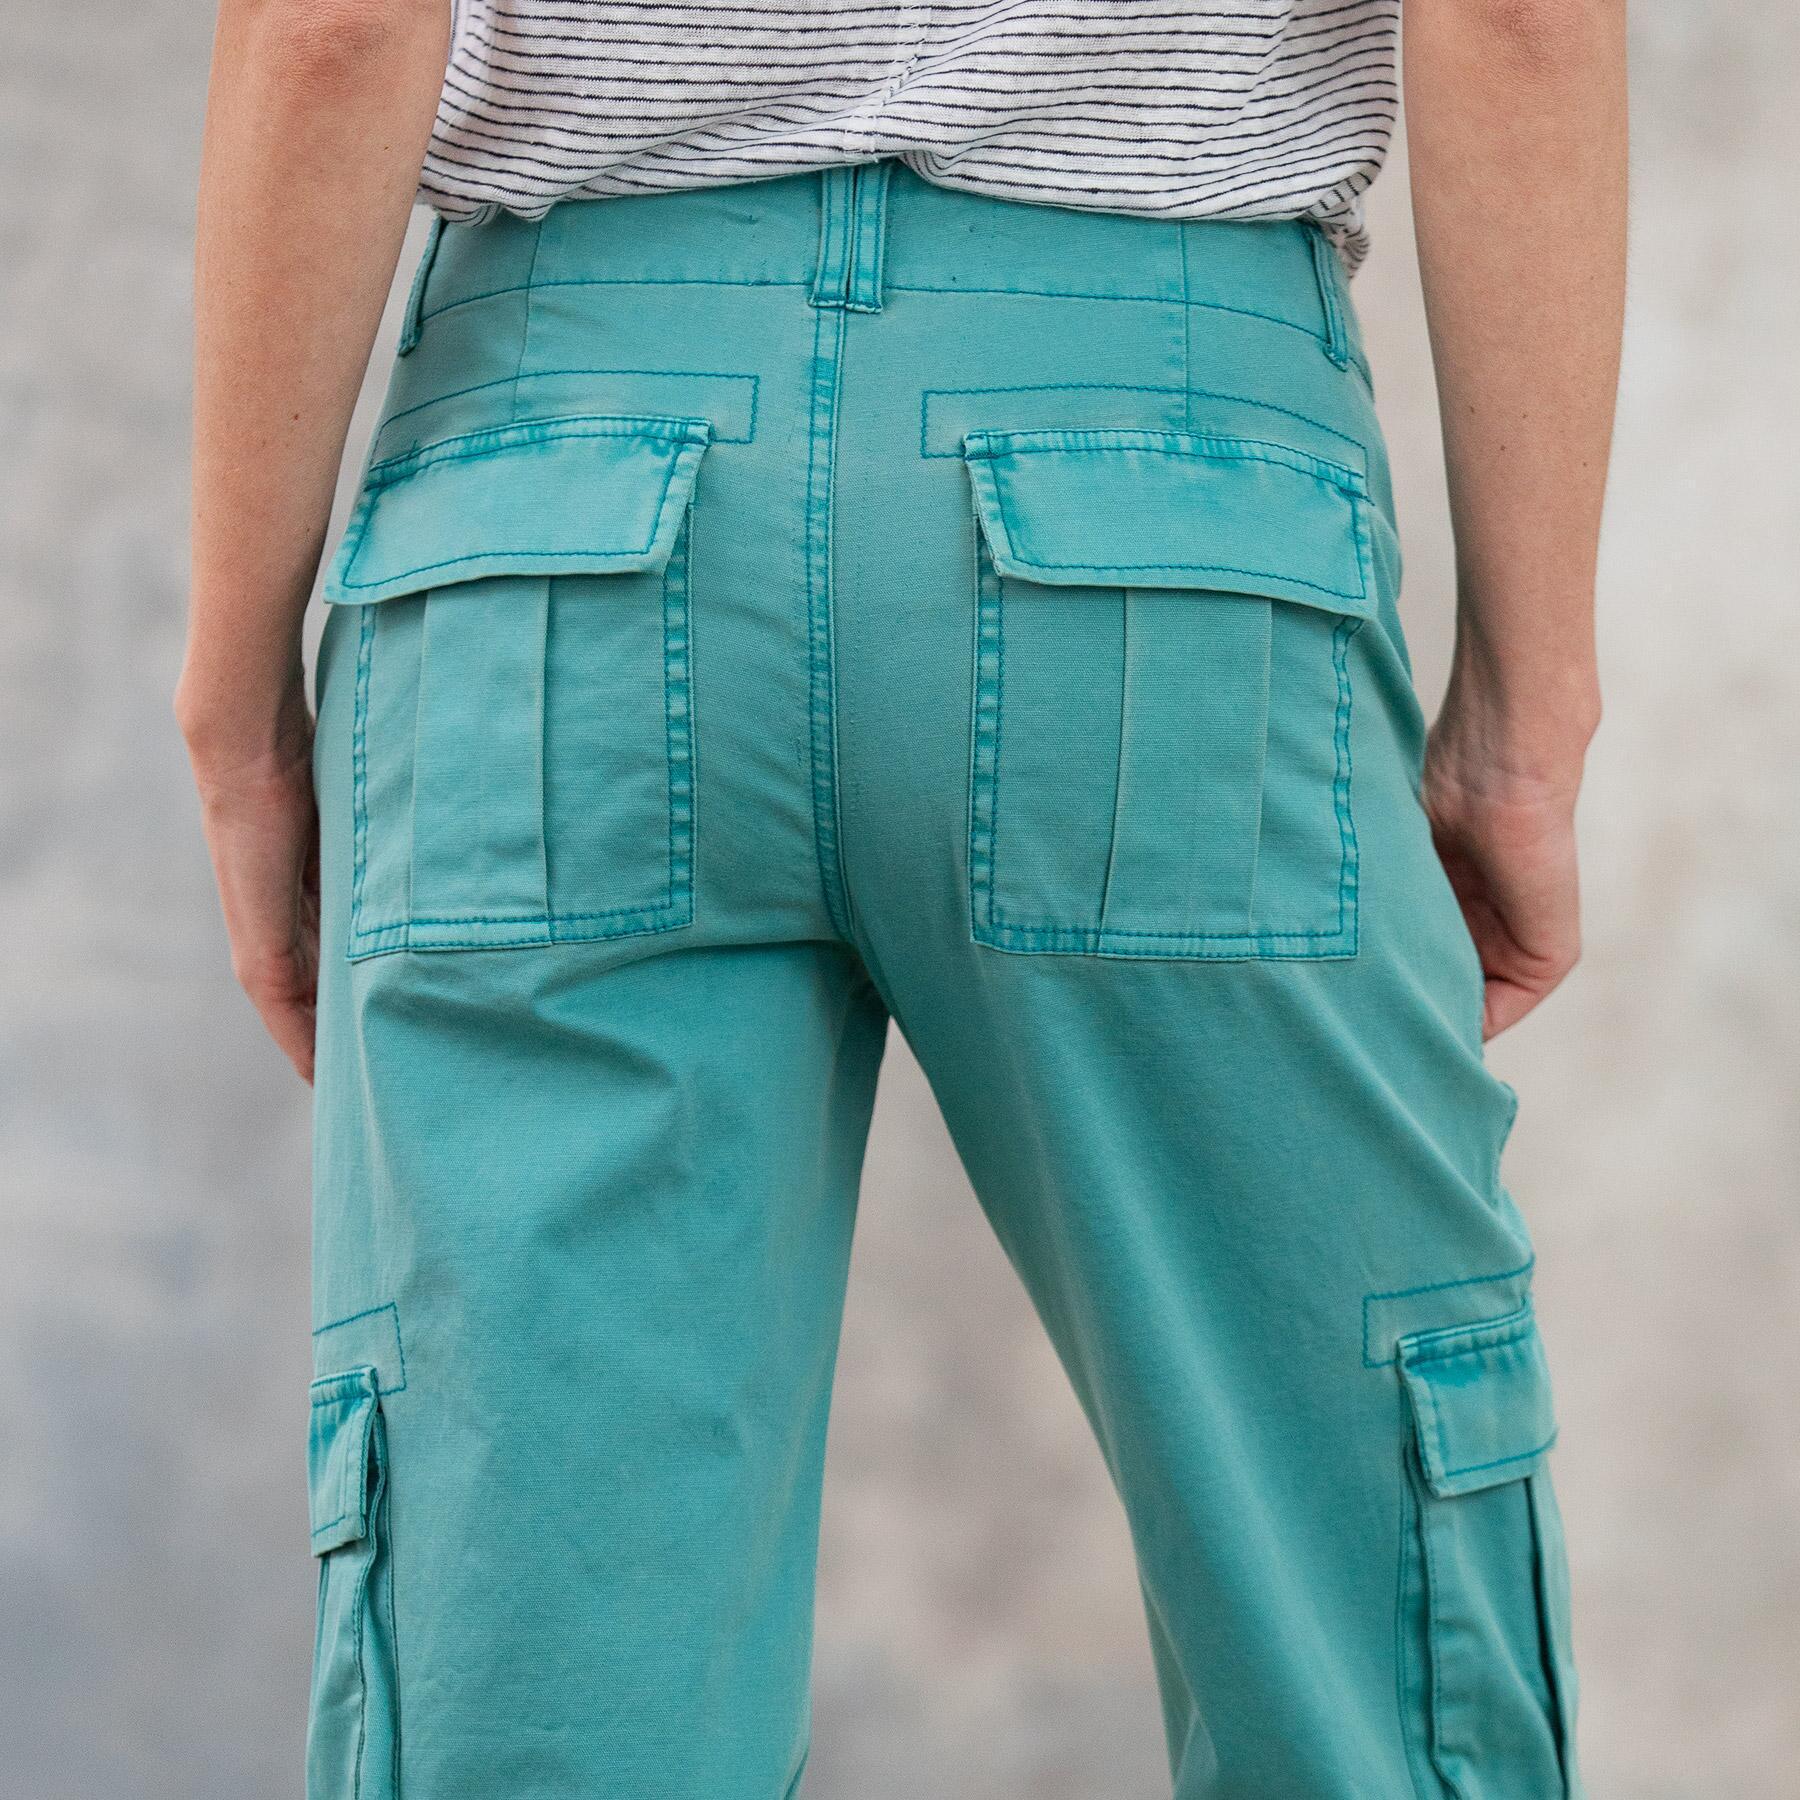 CALLIOPE CARGO PANTS - PETITES: View 6